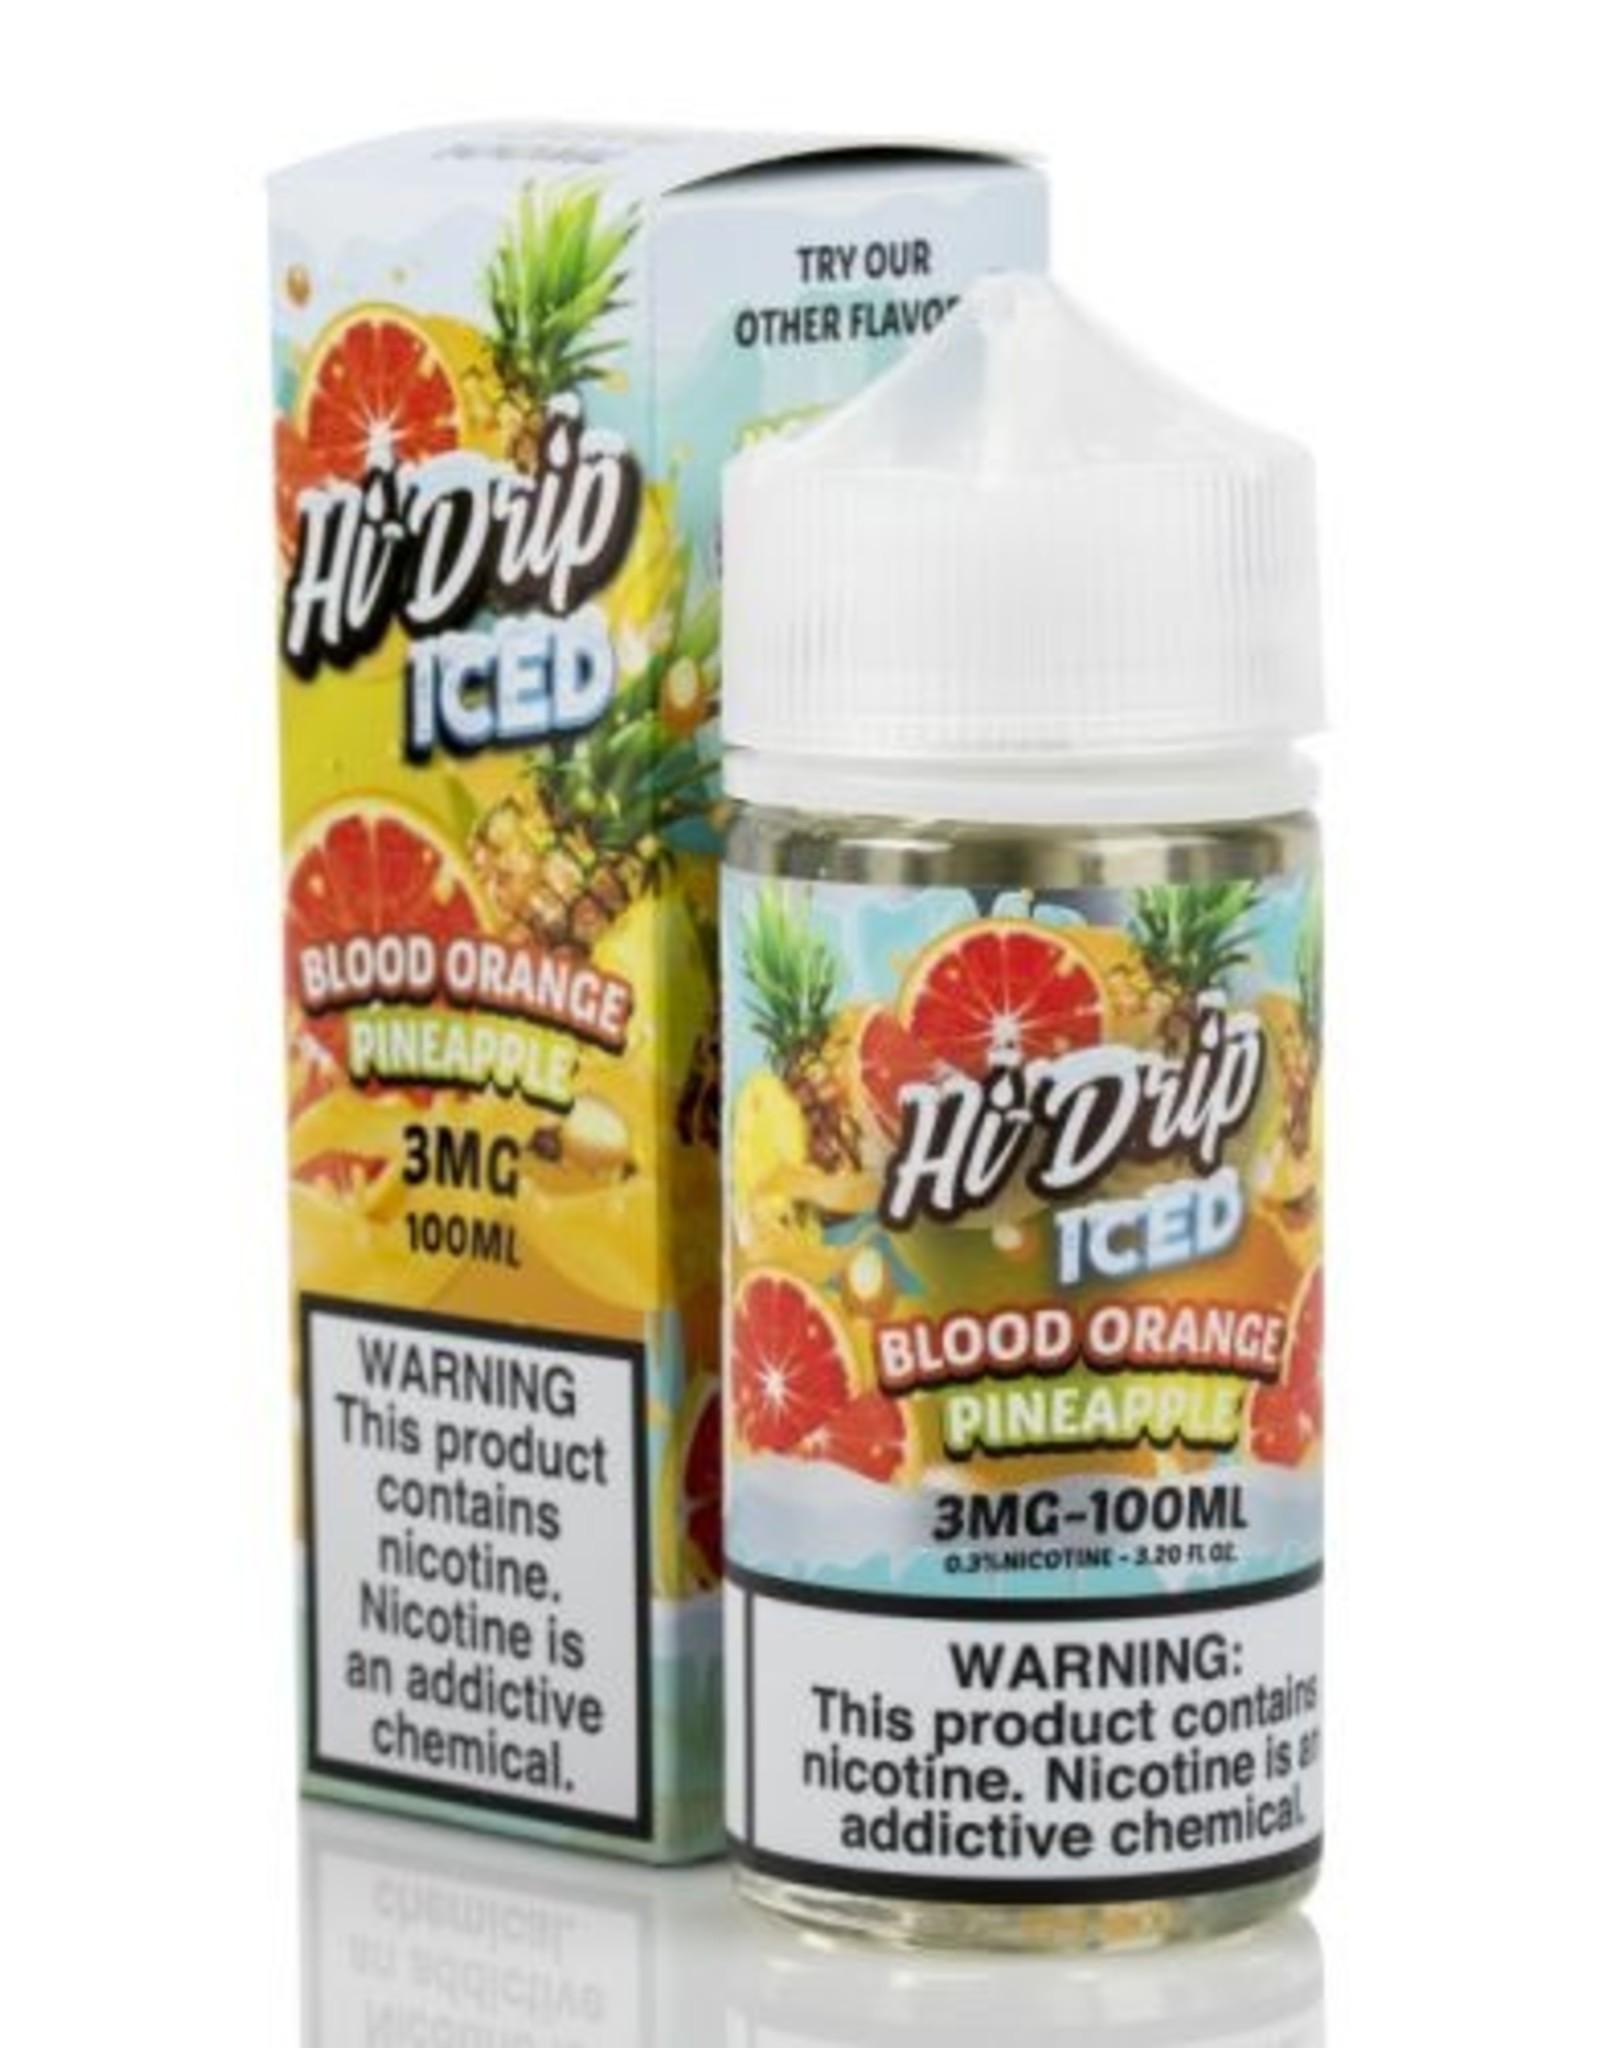 Hi-Drip Island Orange Pineapple Iced By Hi-Drip ( Blood Orange Pineapple Iced )